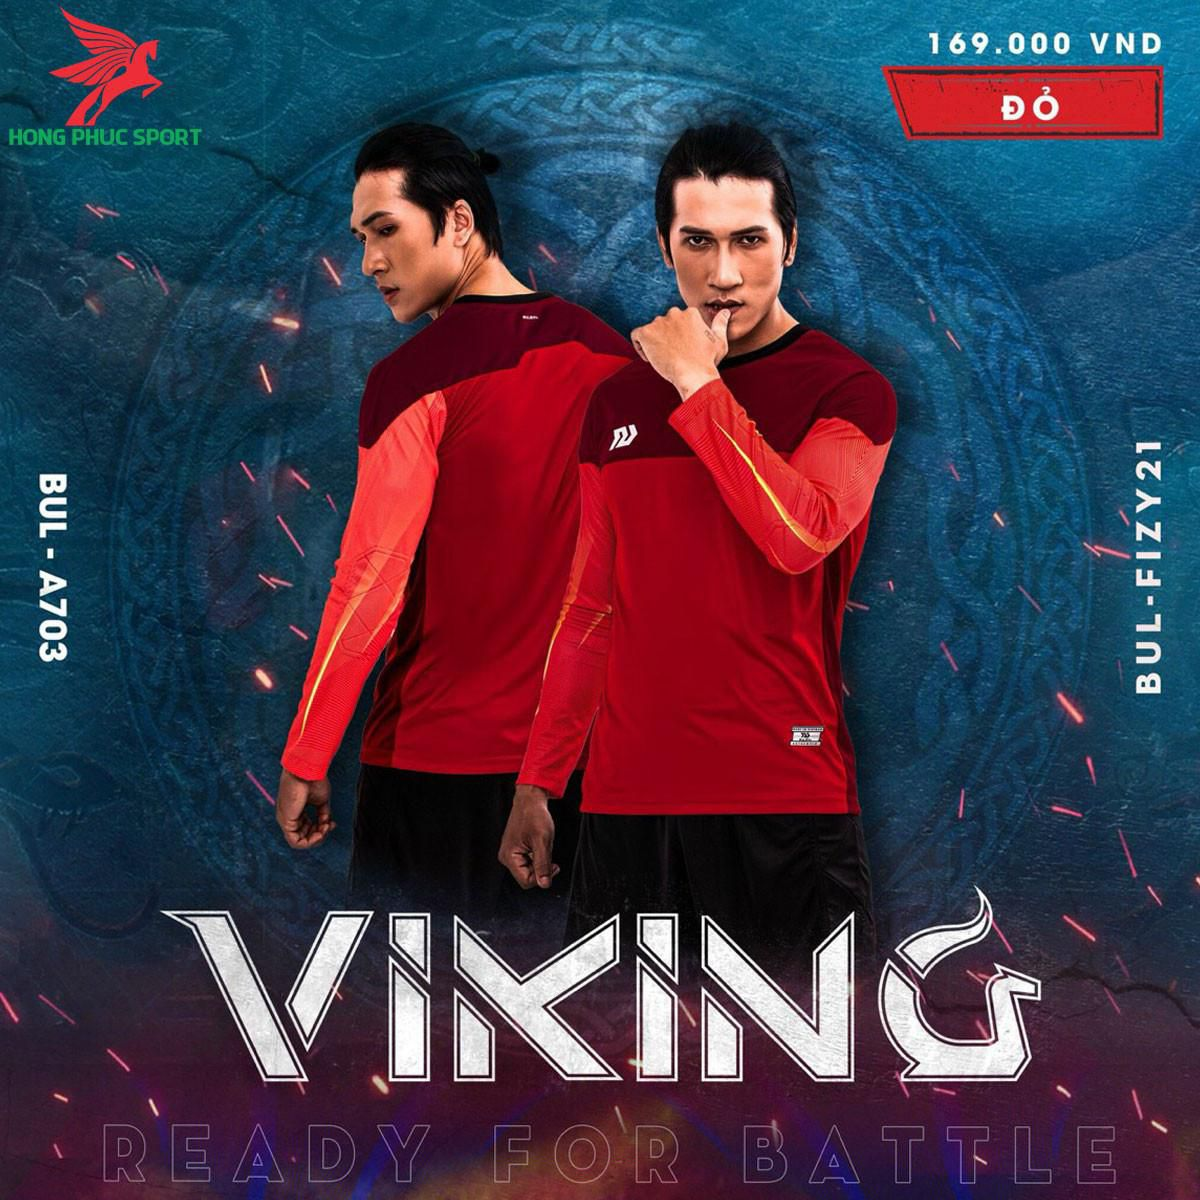 https://cdn.hongphucsport.com/unsafe/s4.shopbay.vn/files/285/ao-thu-mon-khong-logo-bulbal-viking-mau-do-605161c27815d.jpg